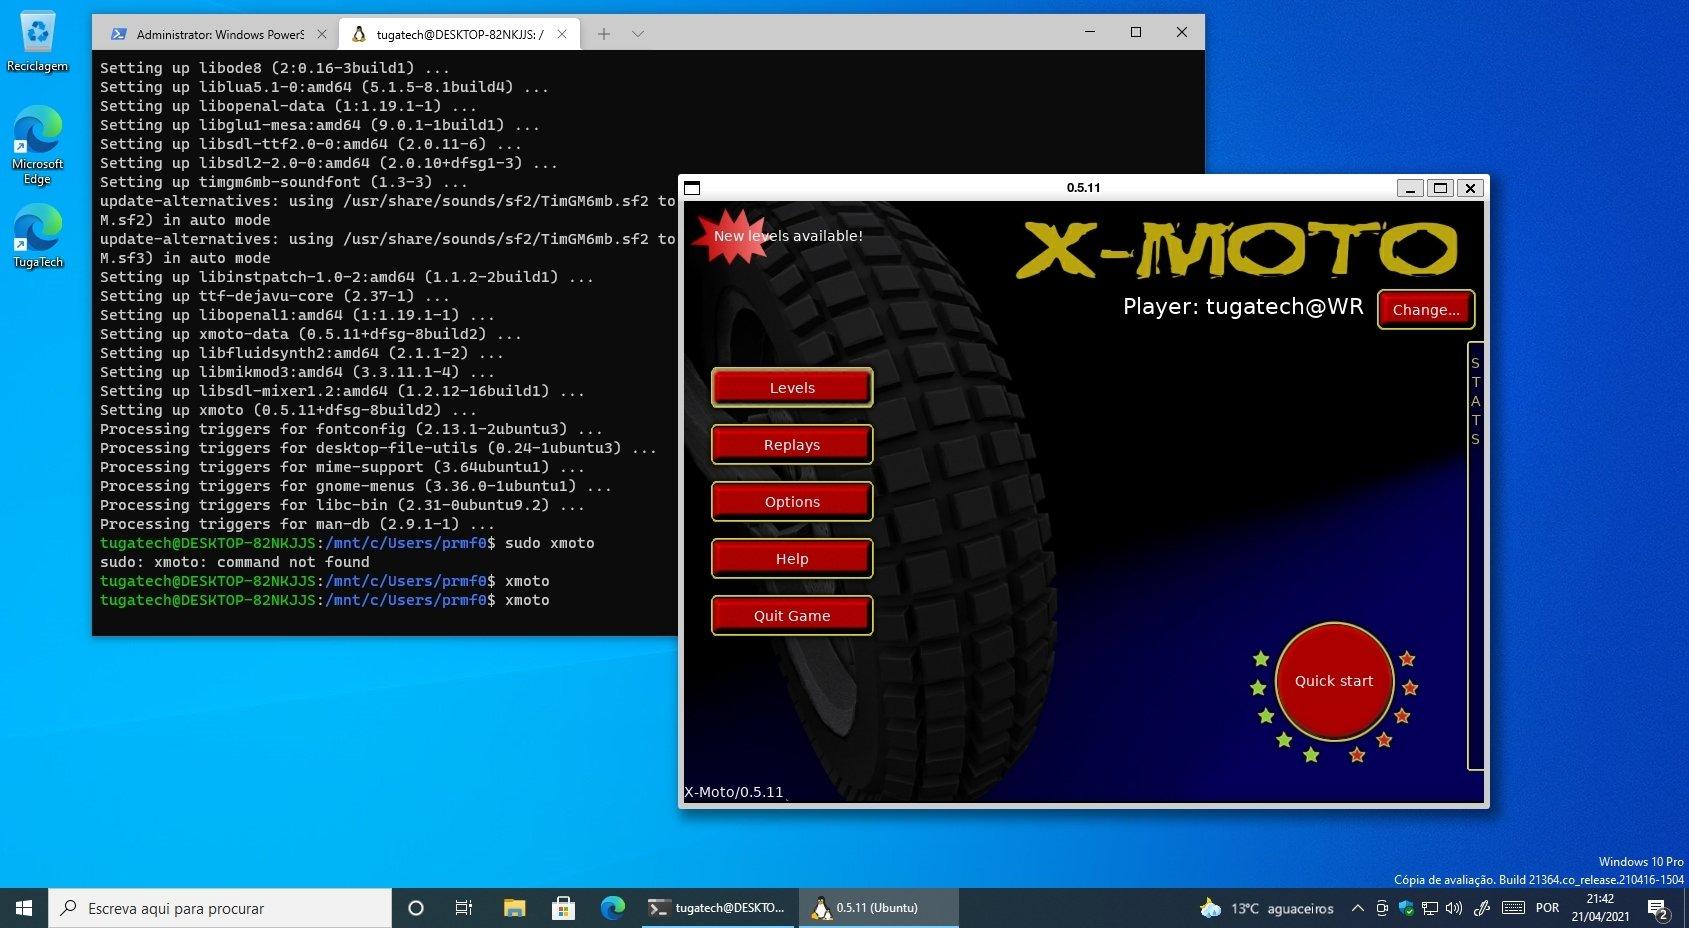 xmoto no windows 10